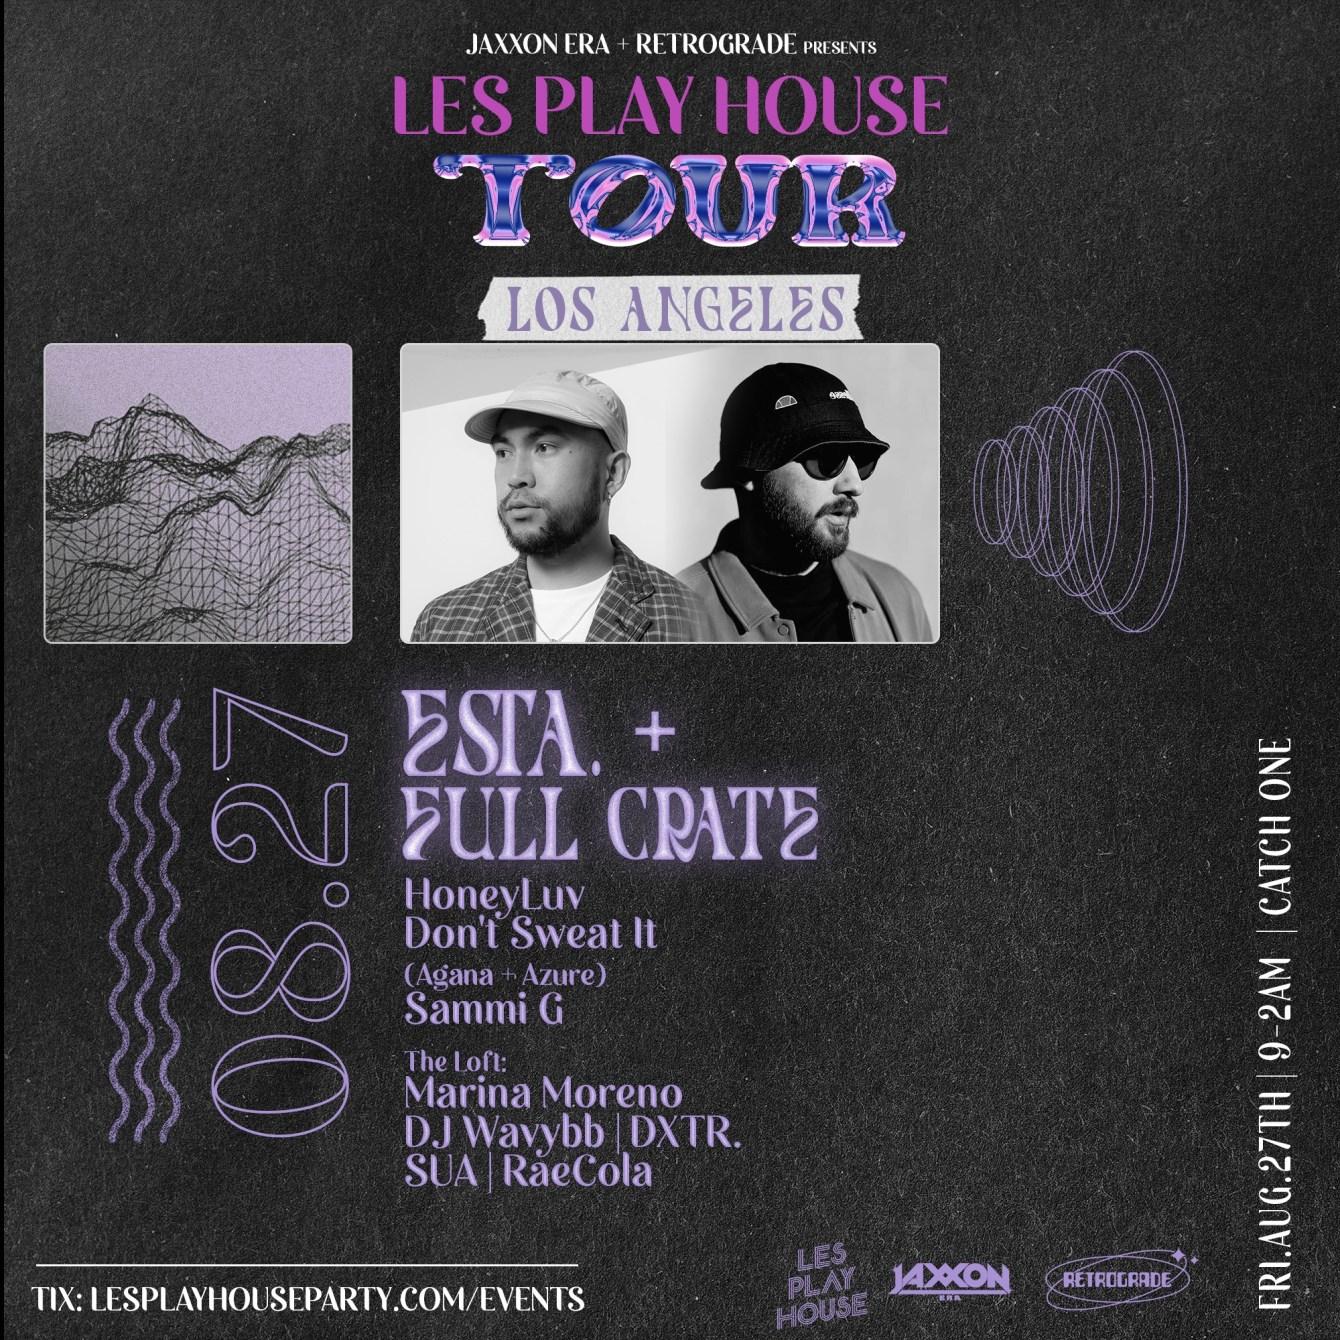 Les Play House Tour: Esta. Full Crate - Flyer front